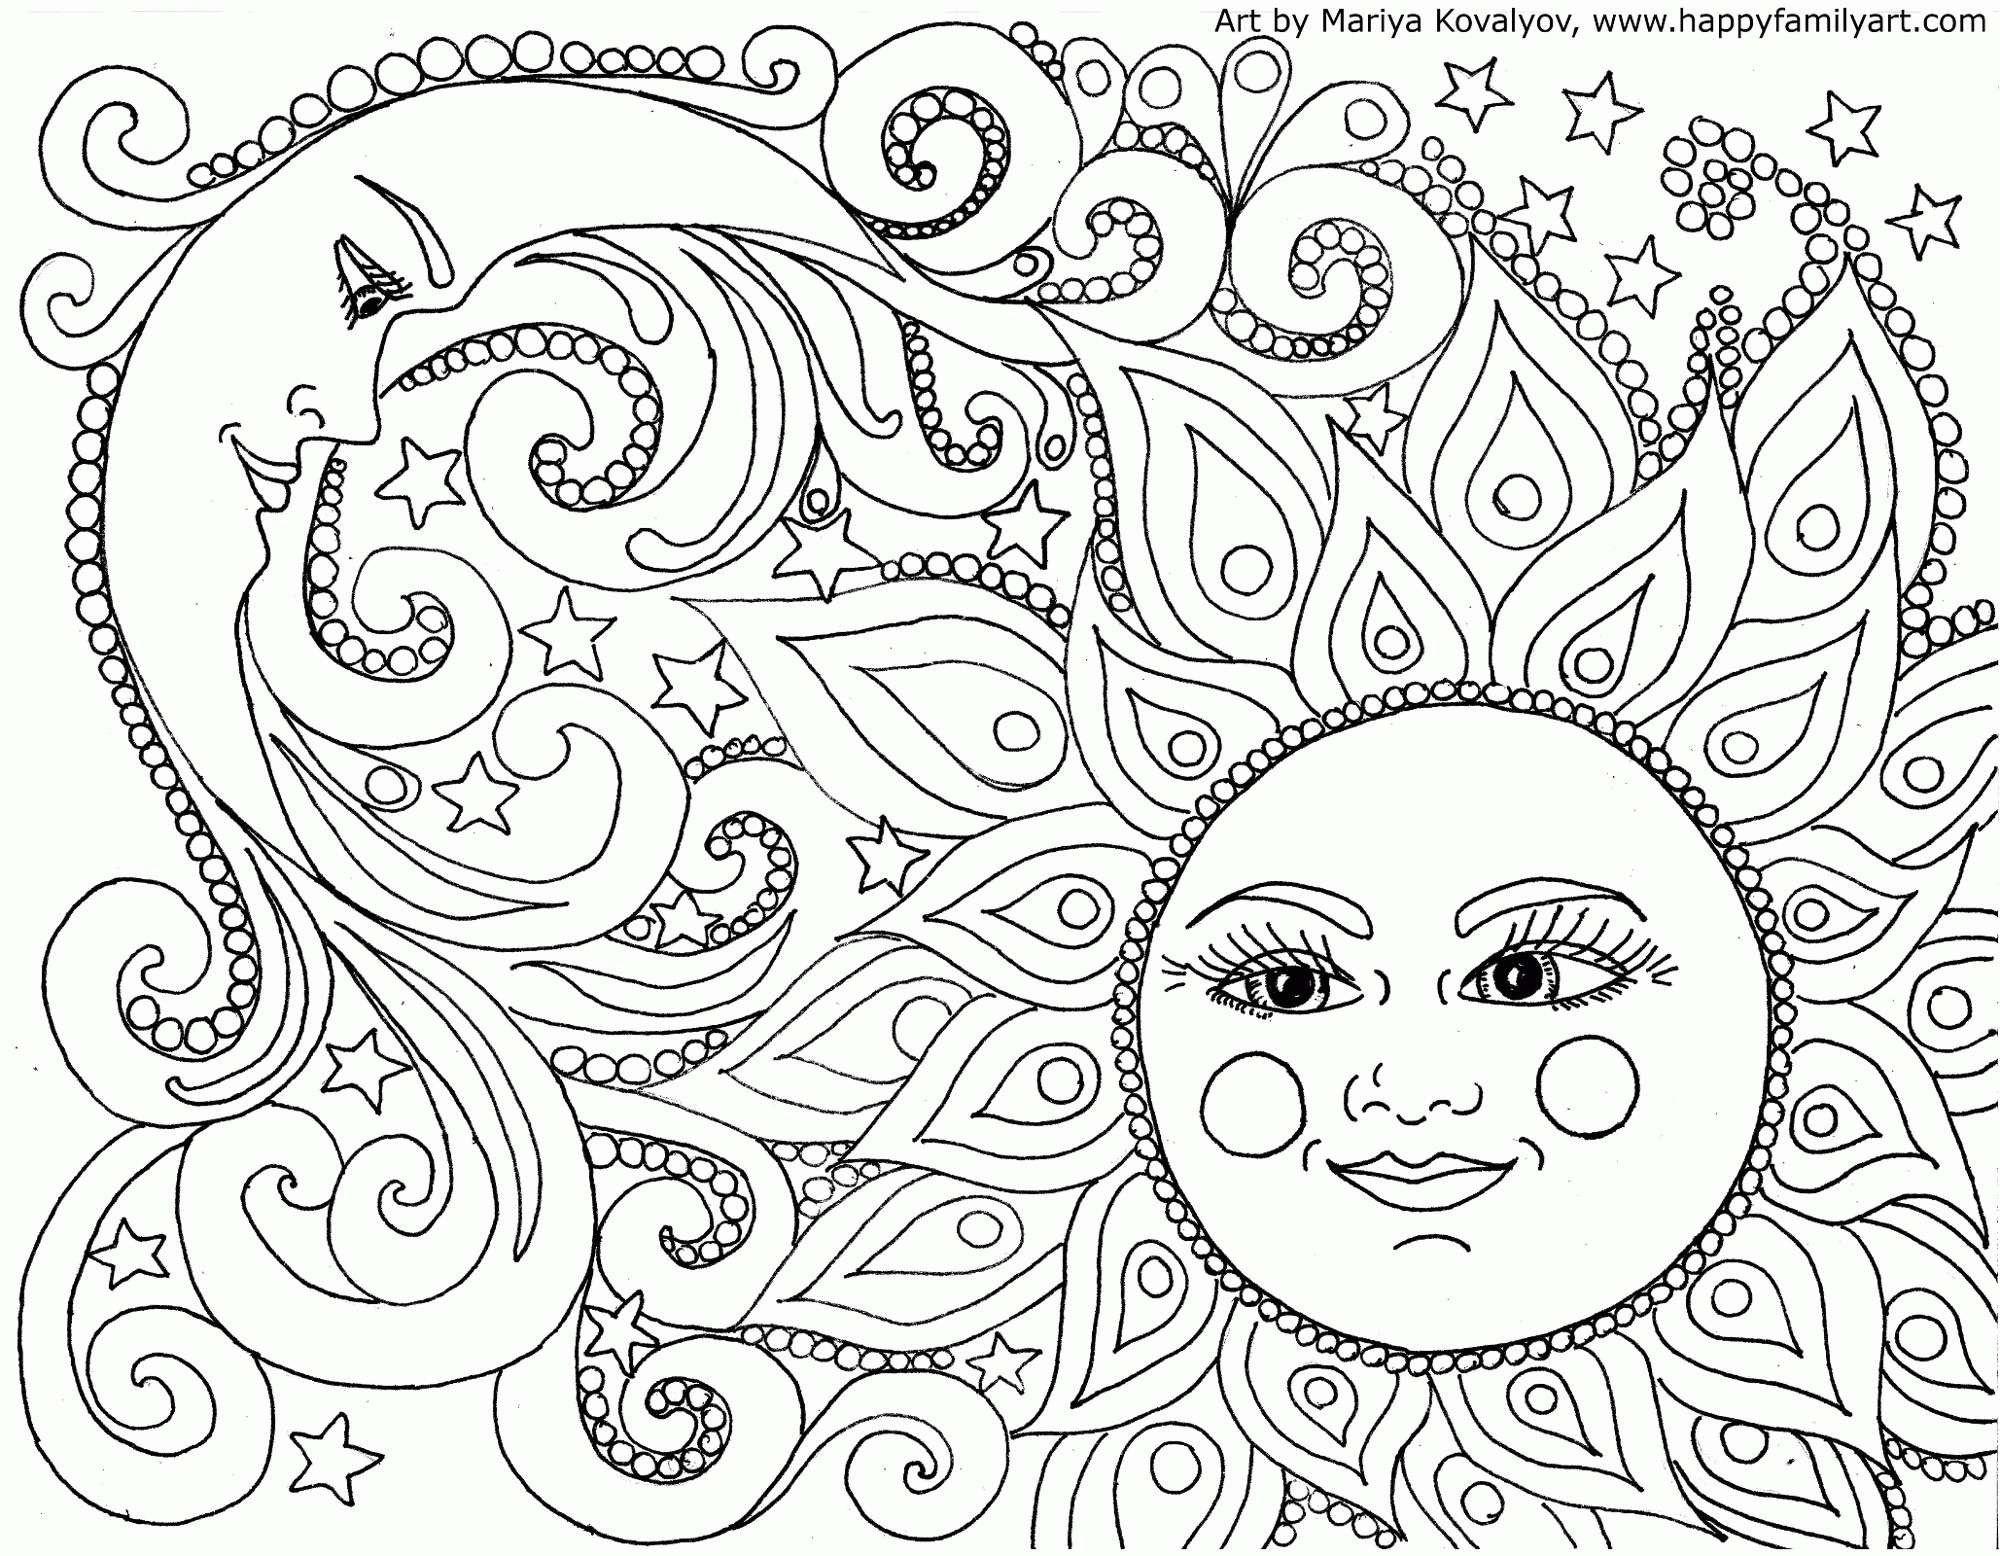 Luxury Mandala Coloring Sheets Pdf | Jvzooreview - Free Printable Mandalas Pdf